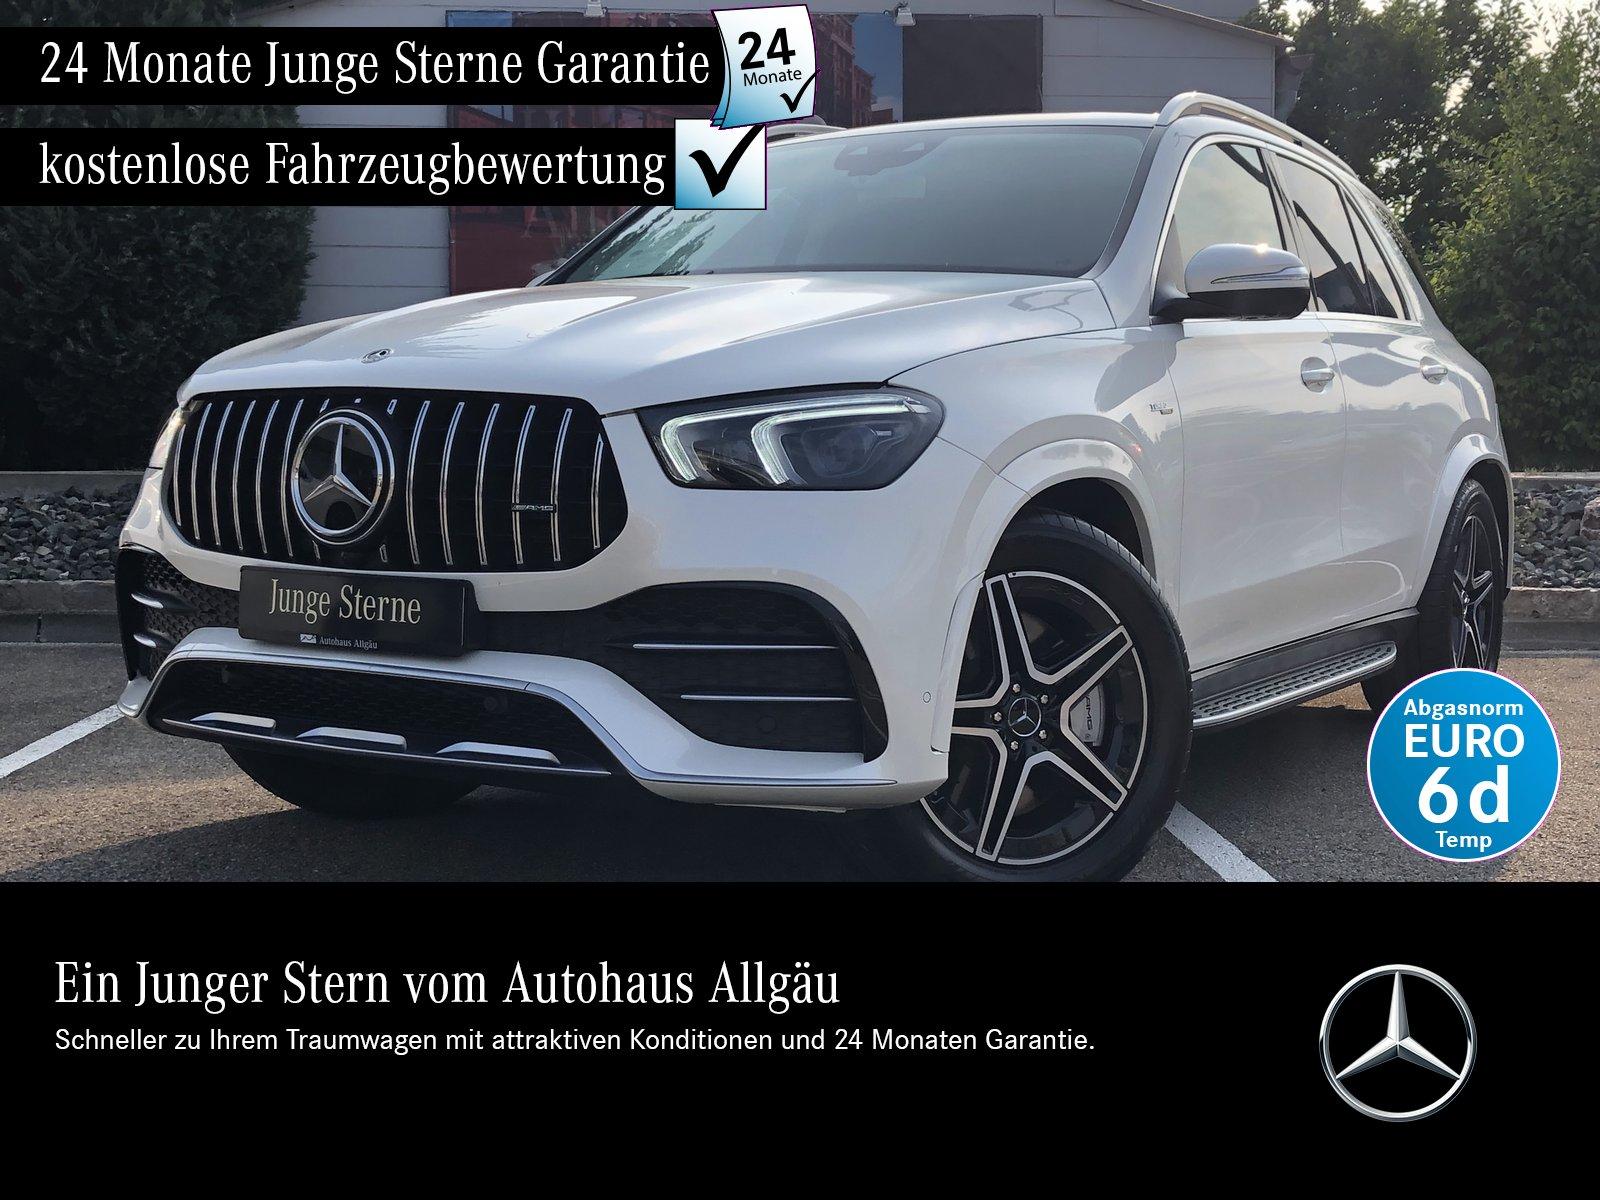 Mercedes-Benz AMG GLE 53 4M+ PERF. AGA+BURMESTER+PANO+AHK+HUD, Jahr 2020, Benzin